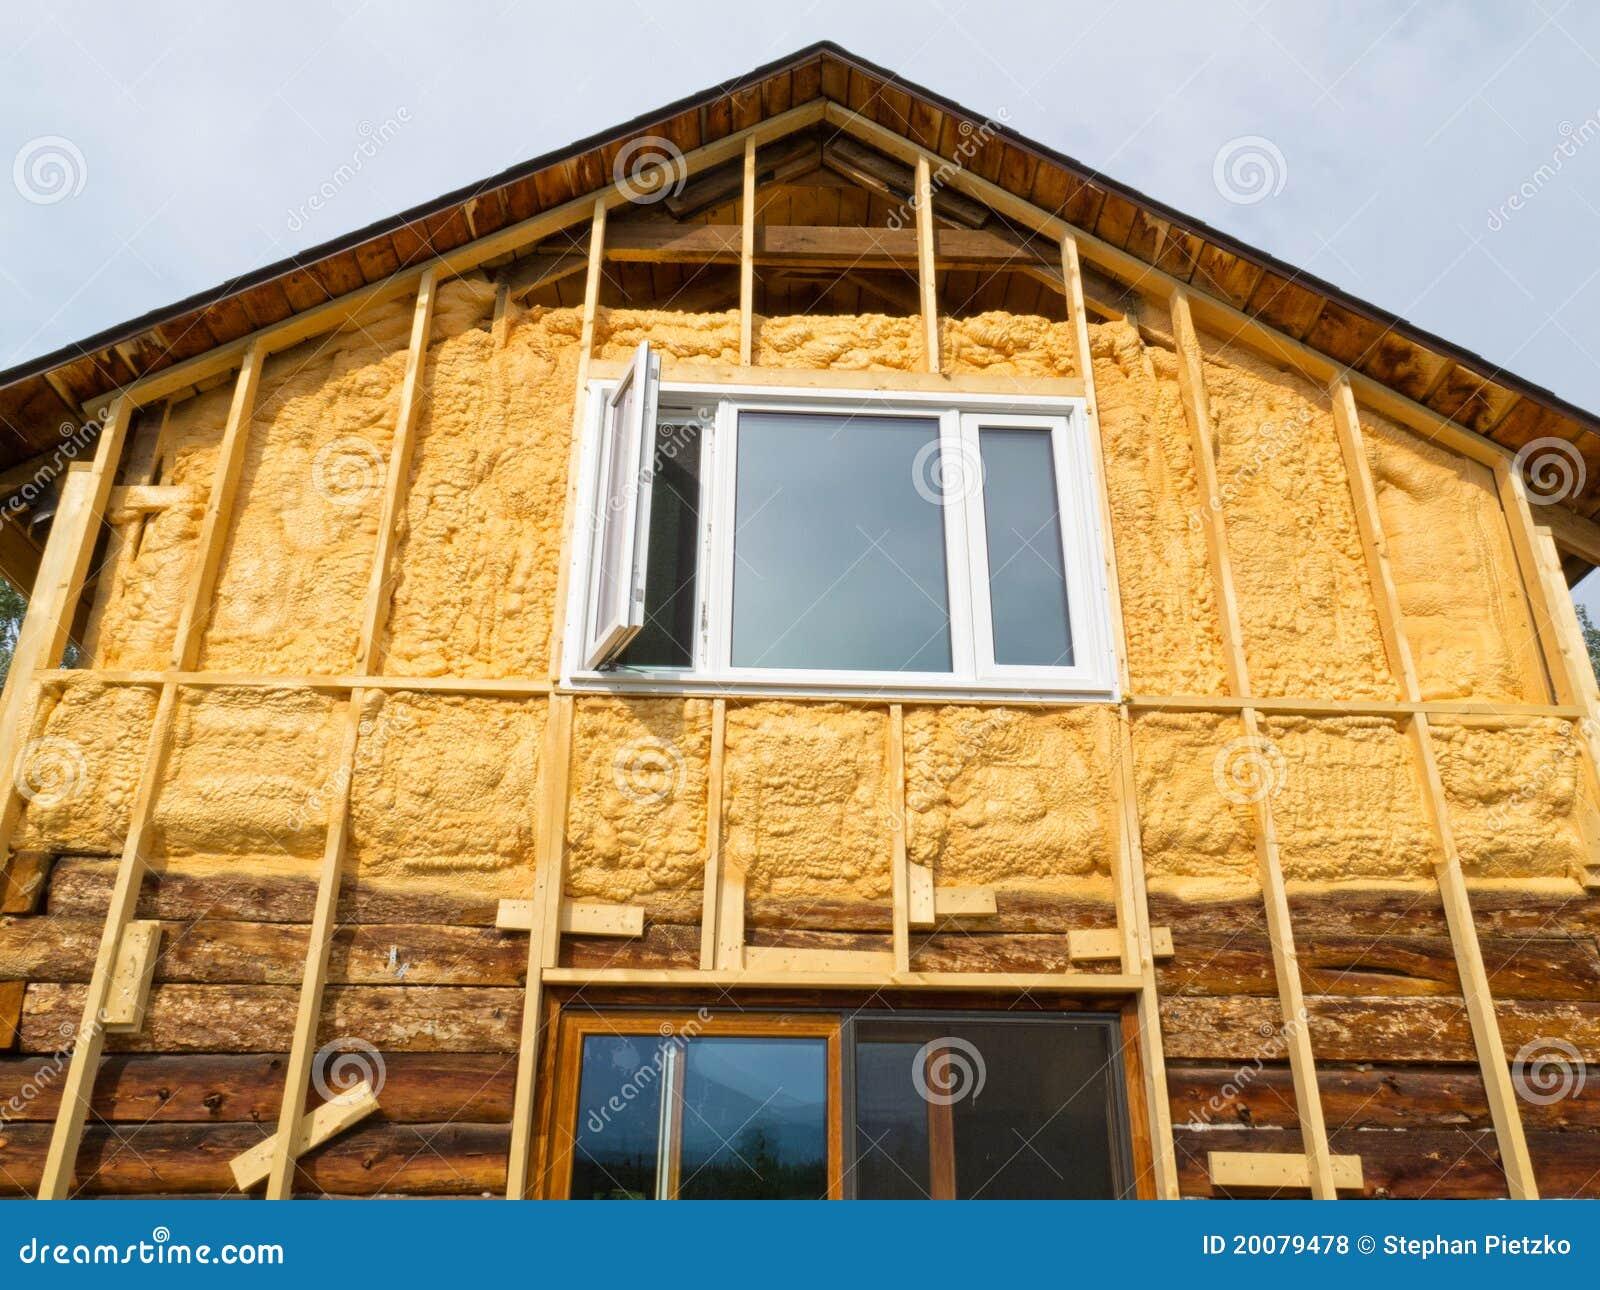 Spray foam insulation for house - Spray Foam Insulation Conserves Energy